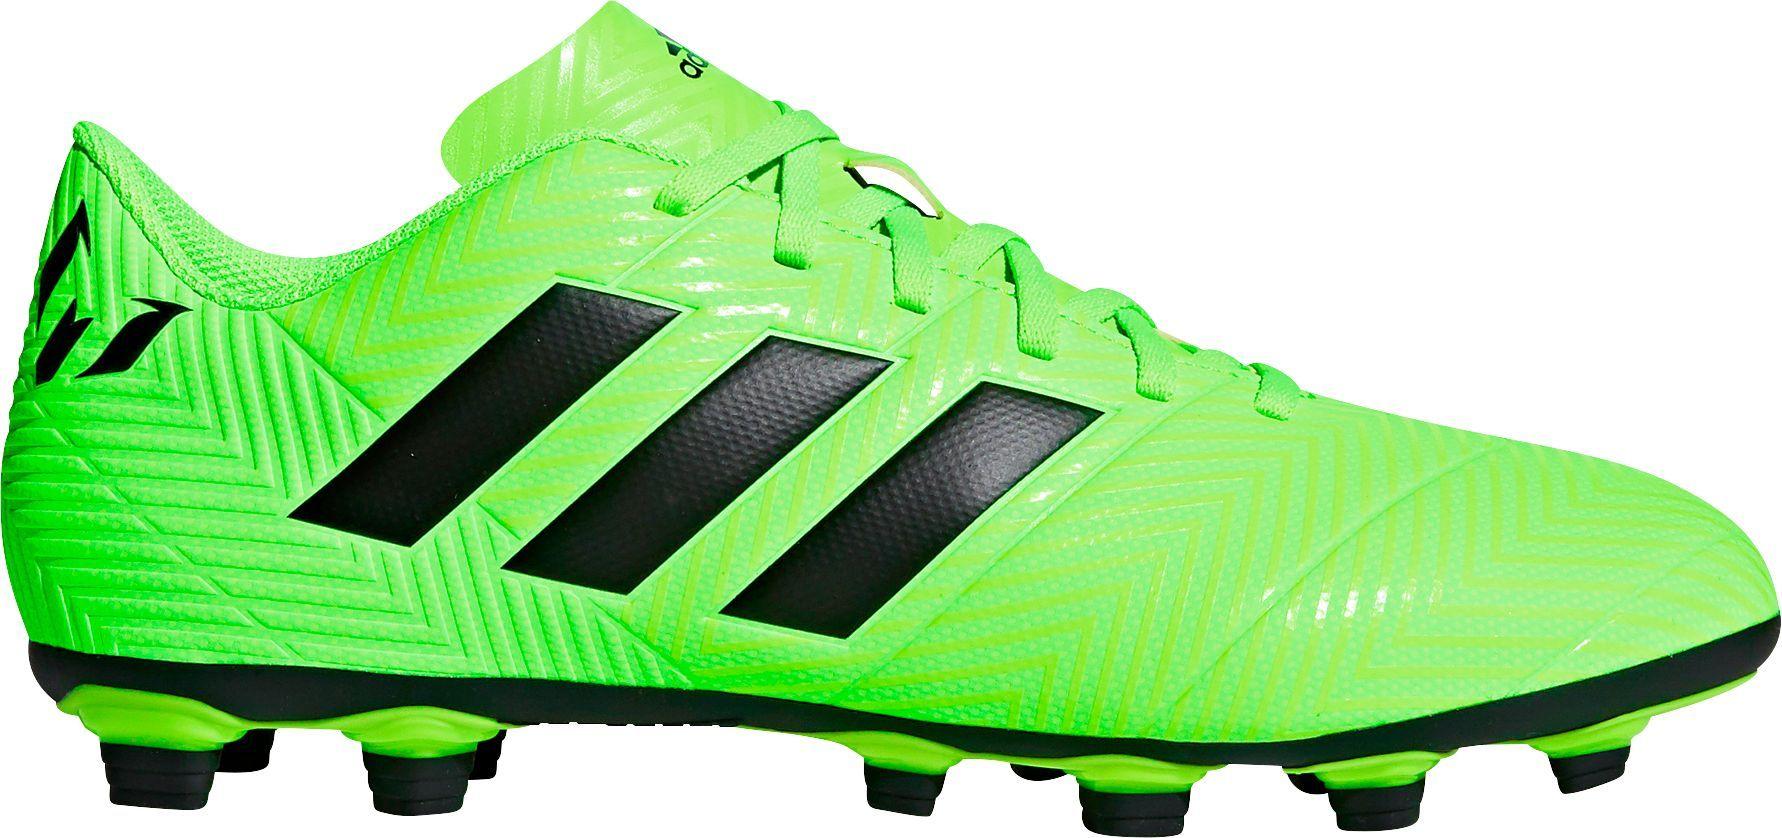 6c1c9990d92 adidas Men s Nemeziz Messi 18.4 FXG Soccer Cleats